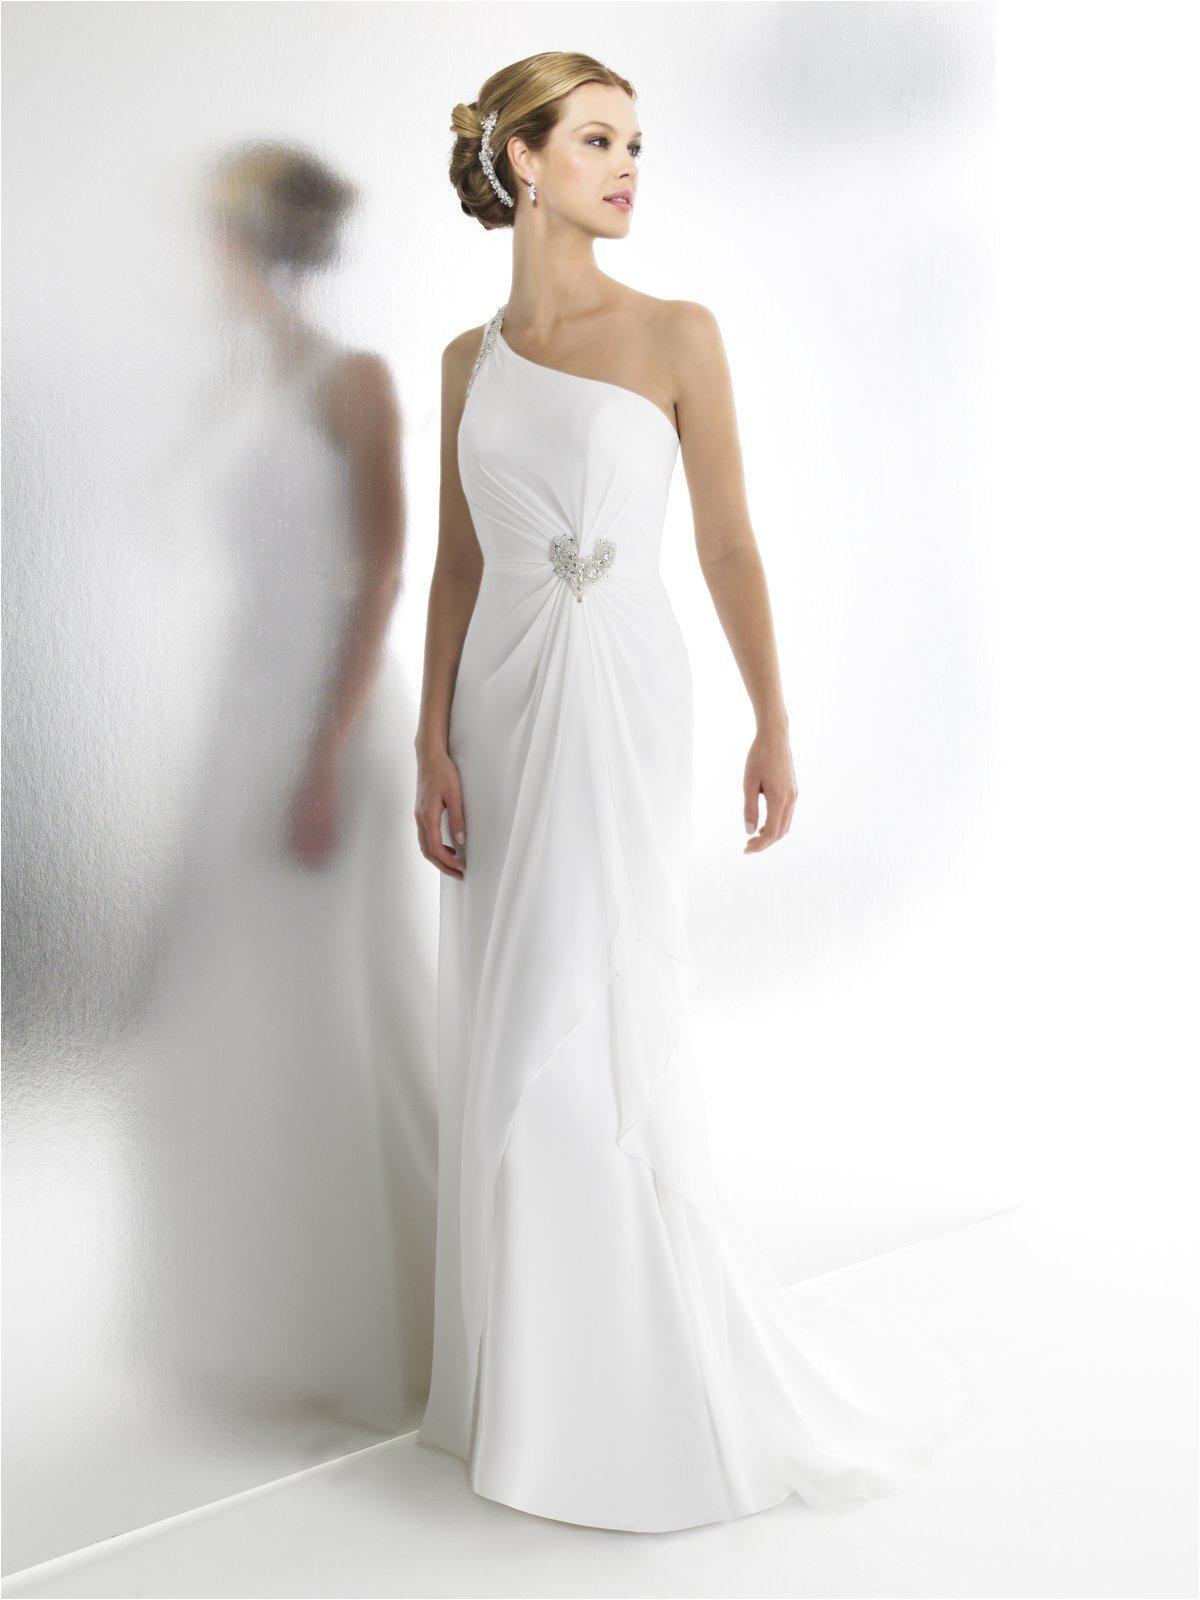 One Shoulder Wedding Dress Hairstyles Chiffon One Shoulder Wedding Dress Hairstyle for Women & Man